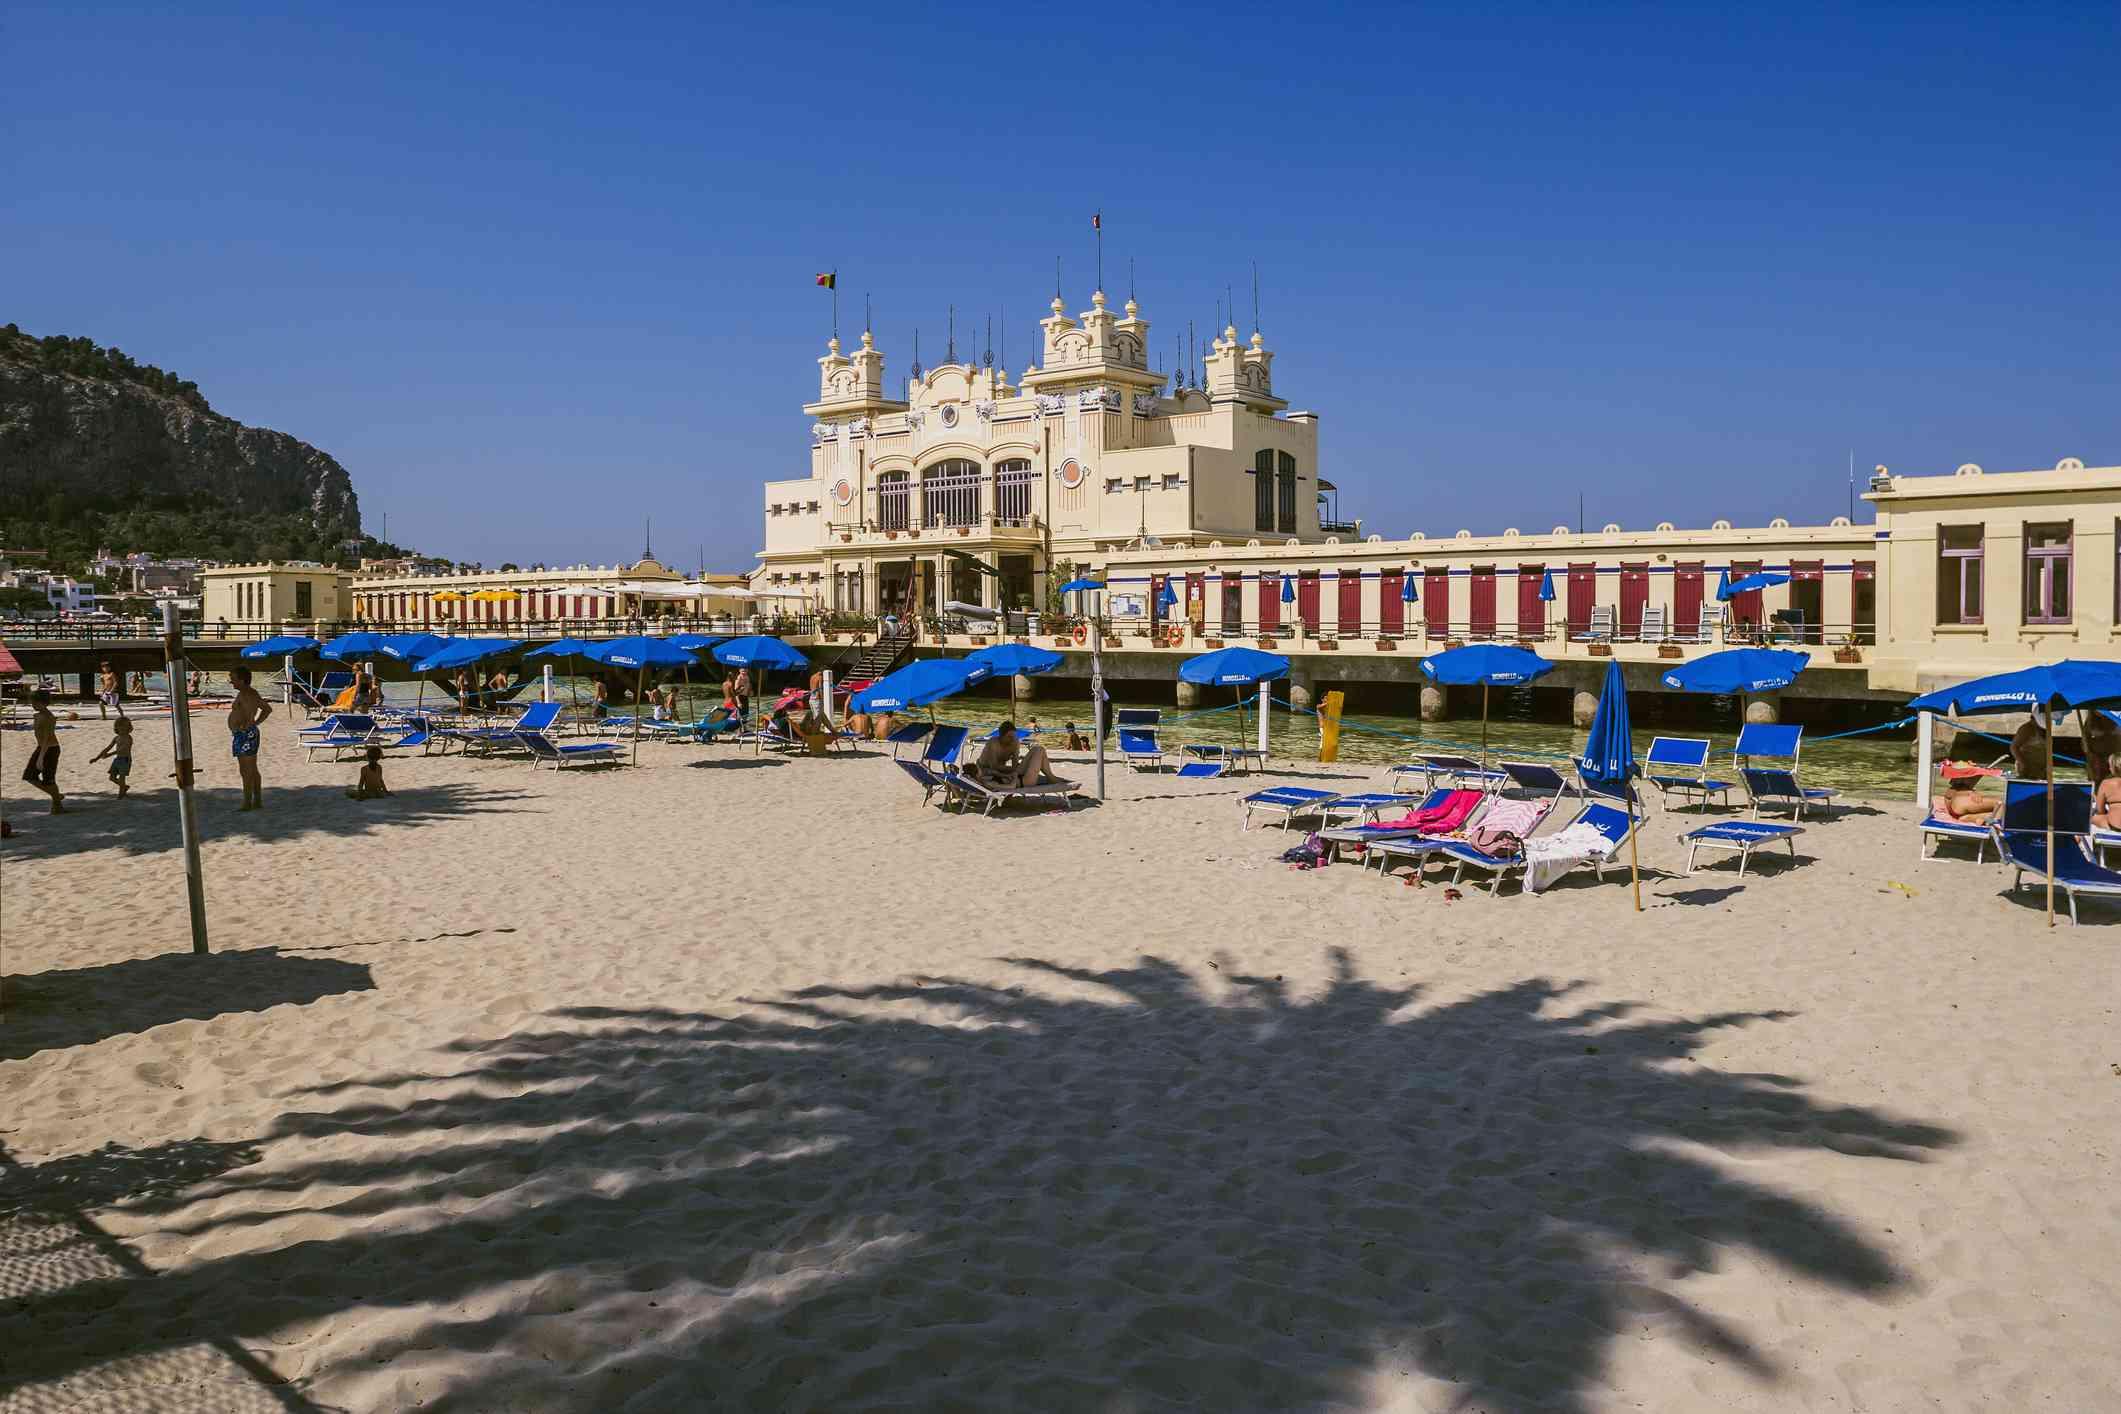 Mondello, beach and Kursaal bathing establishment